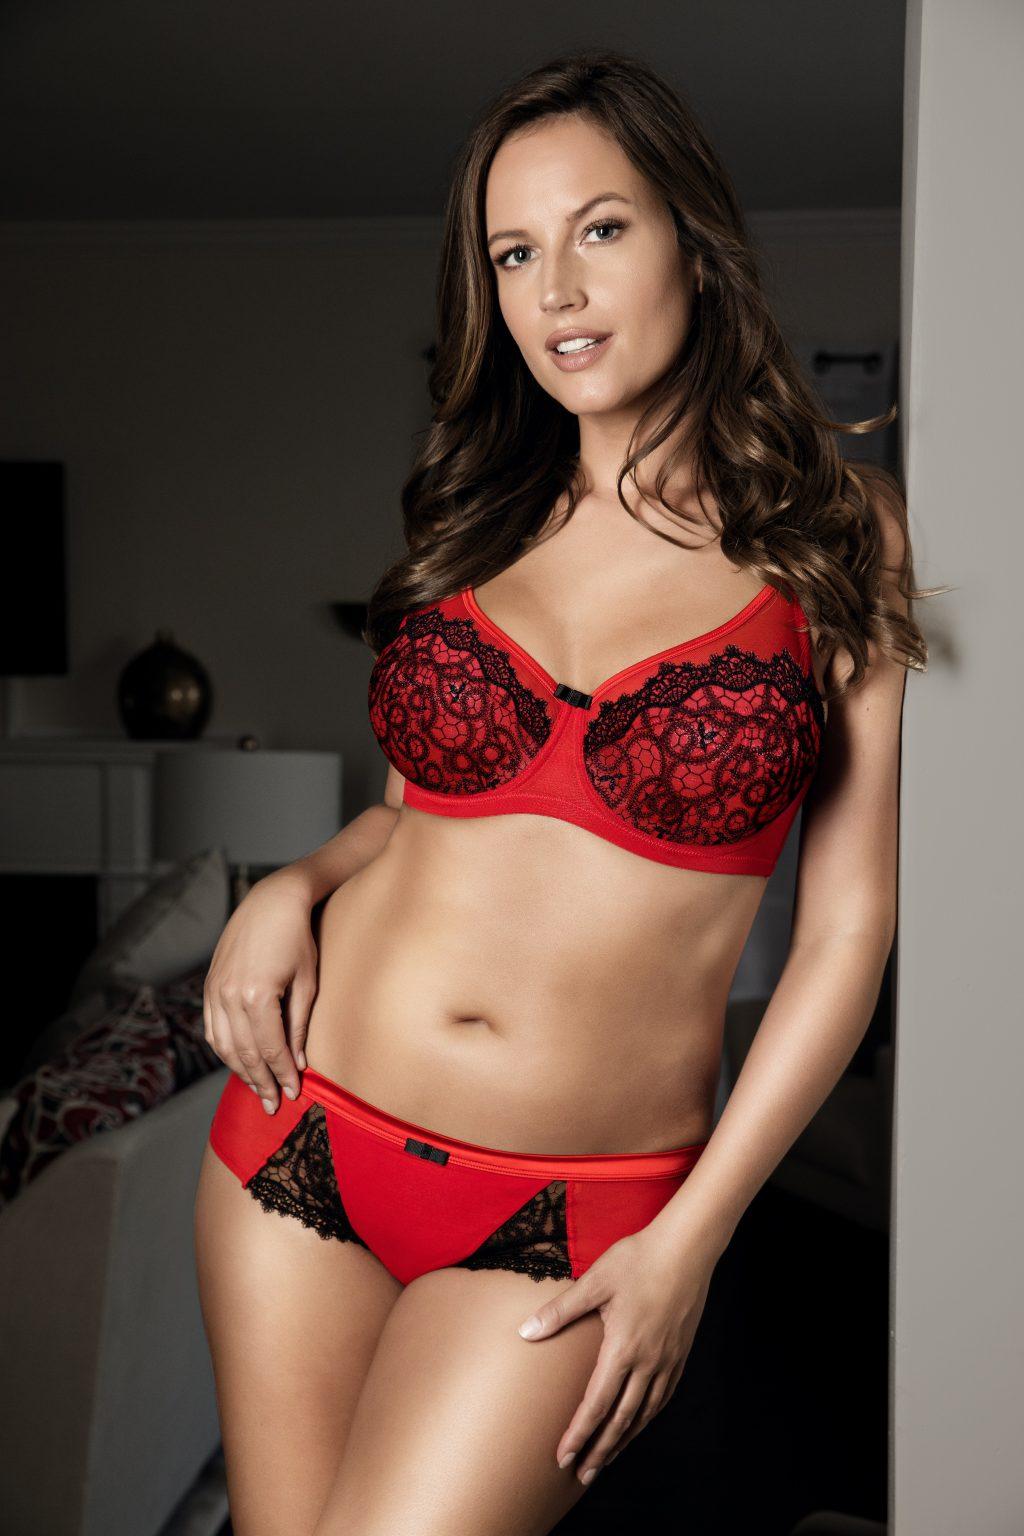 sexy red bra